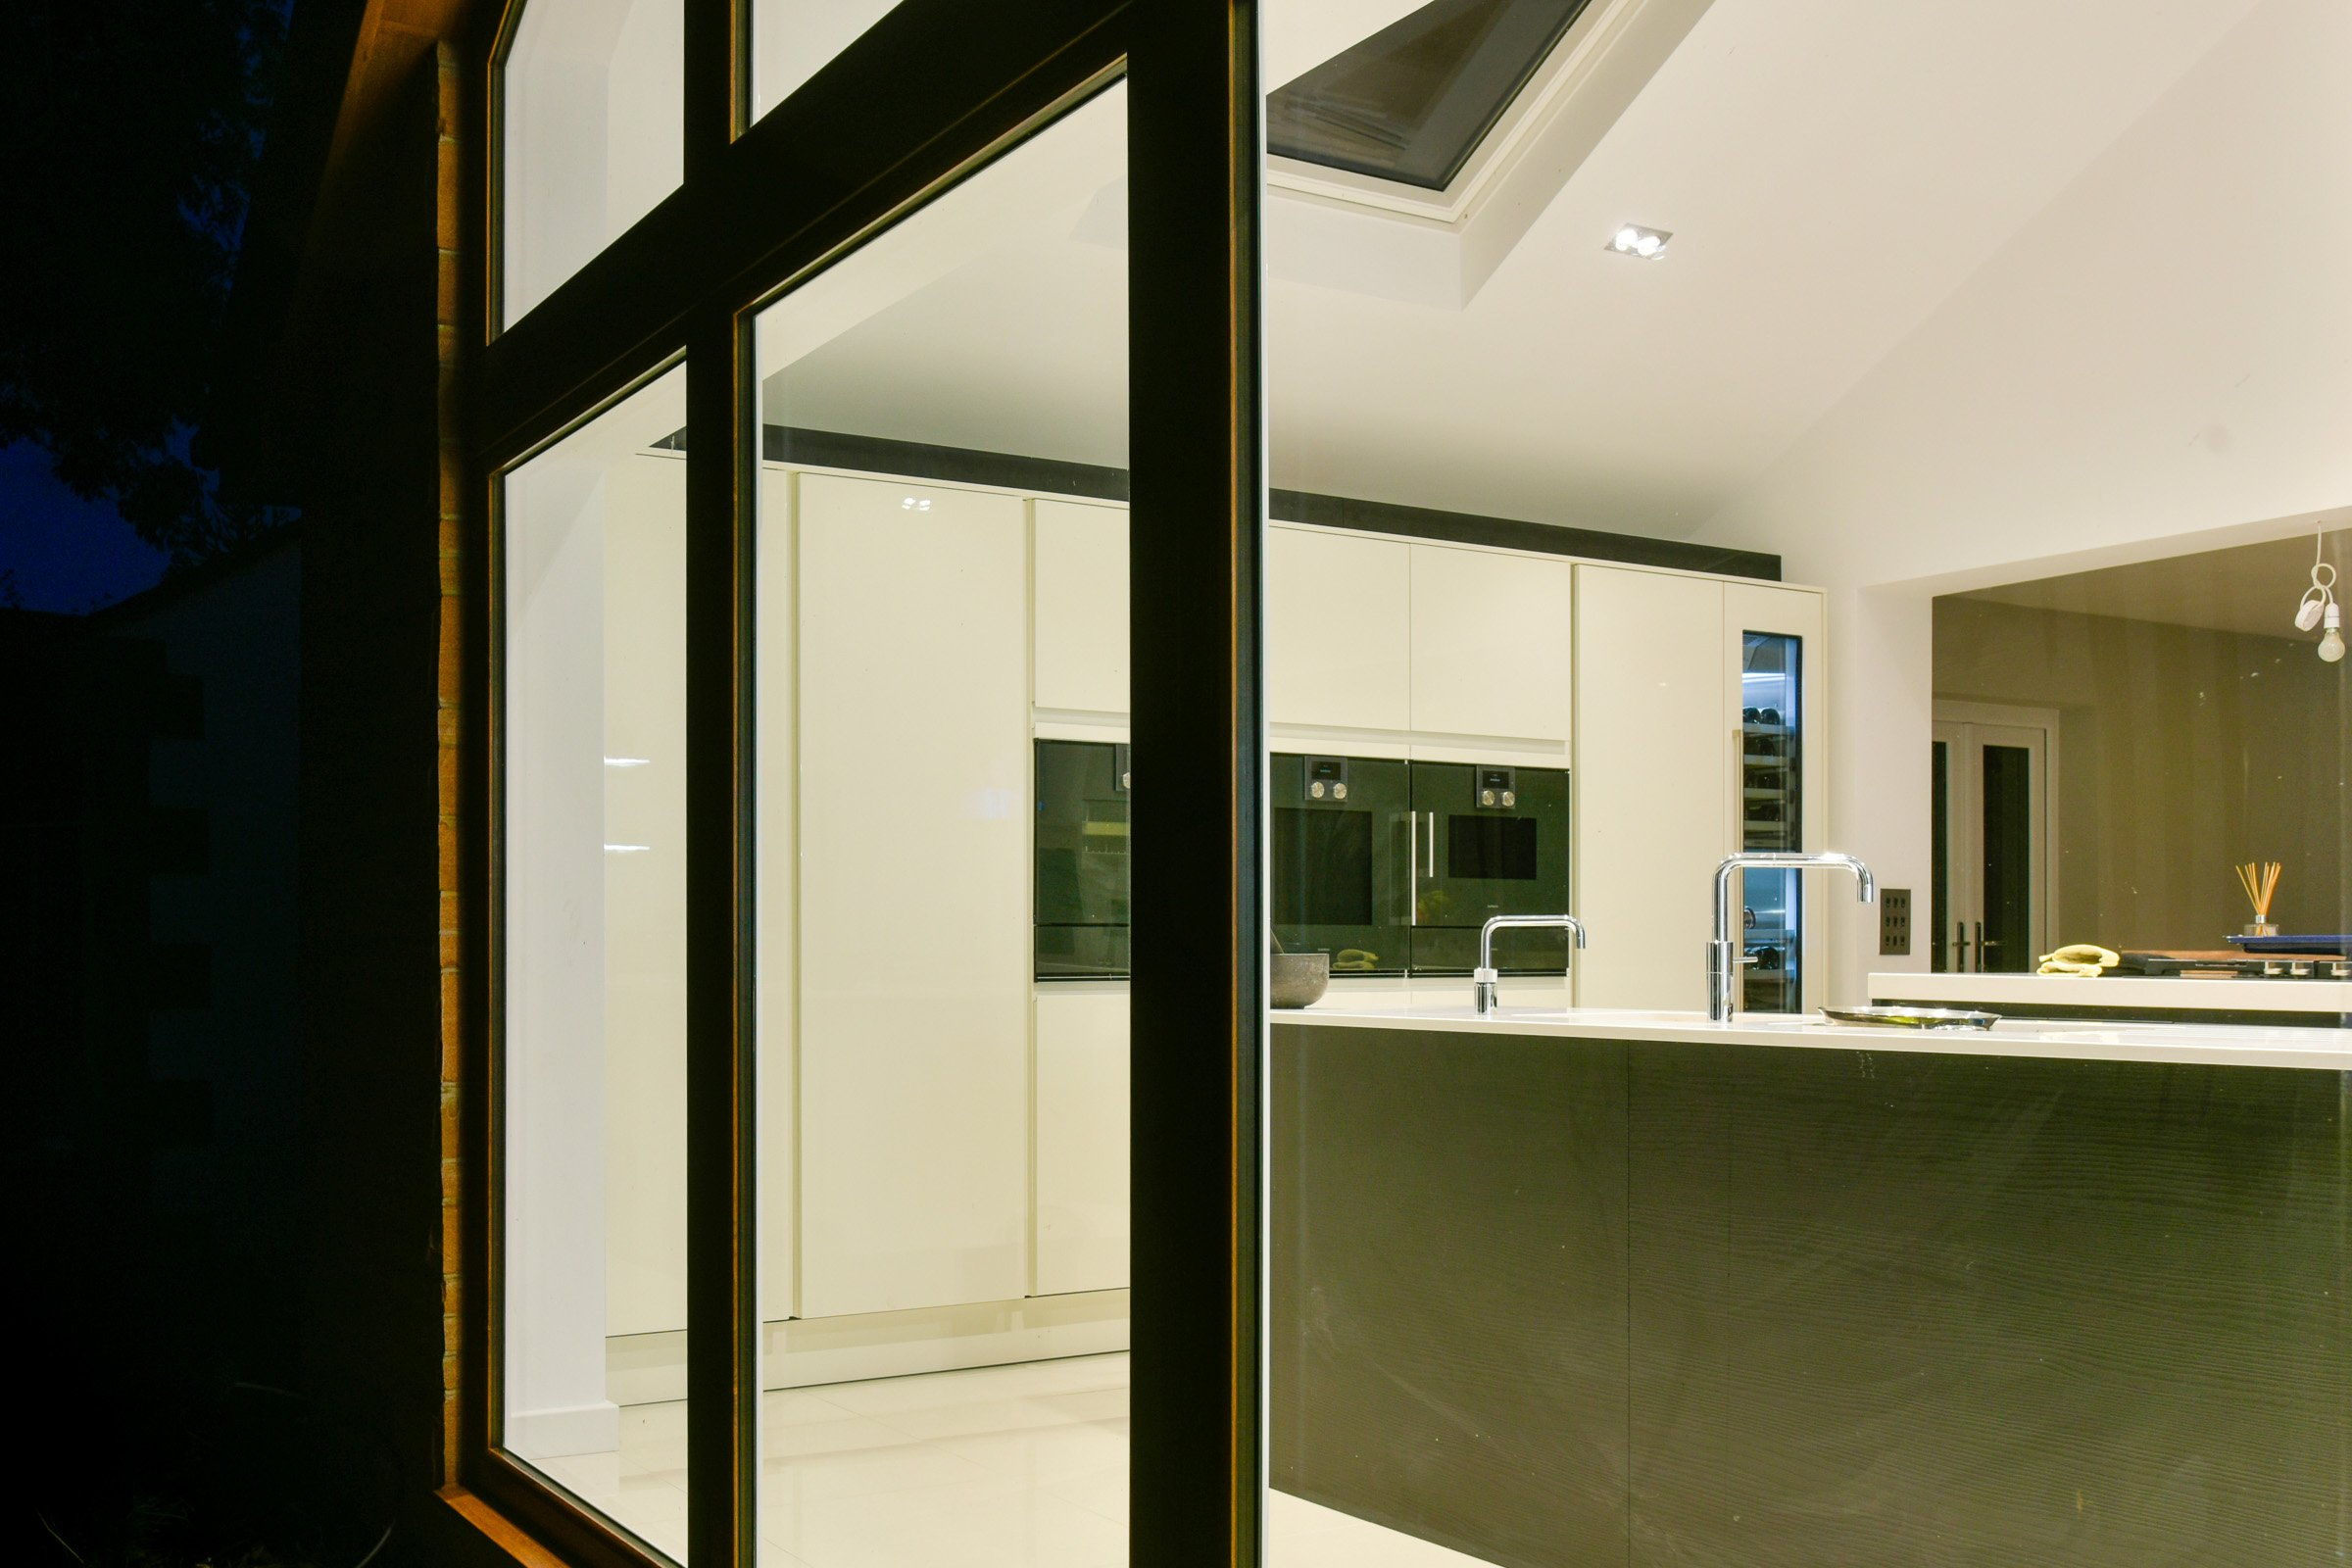 Luxury kitchen with Rako lighting control